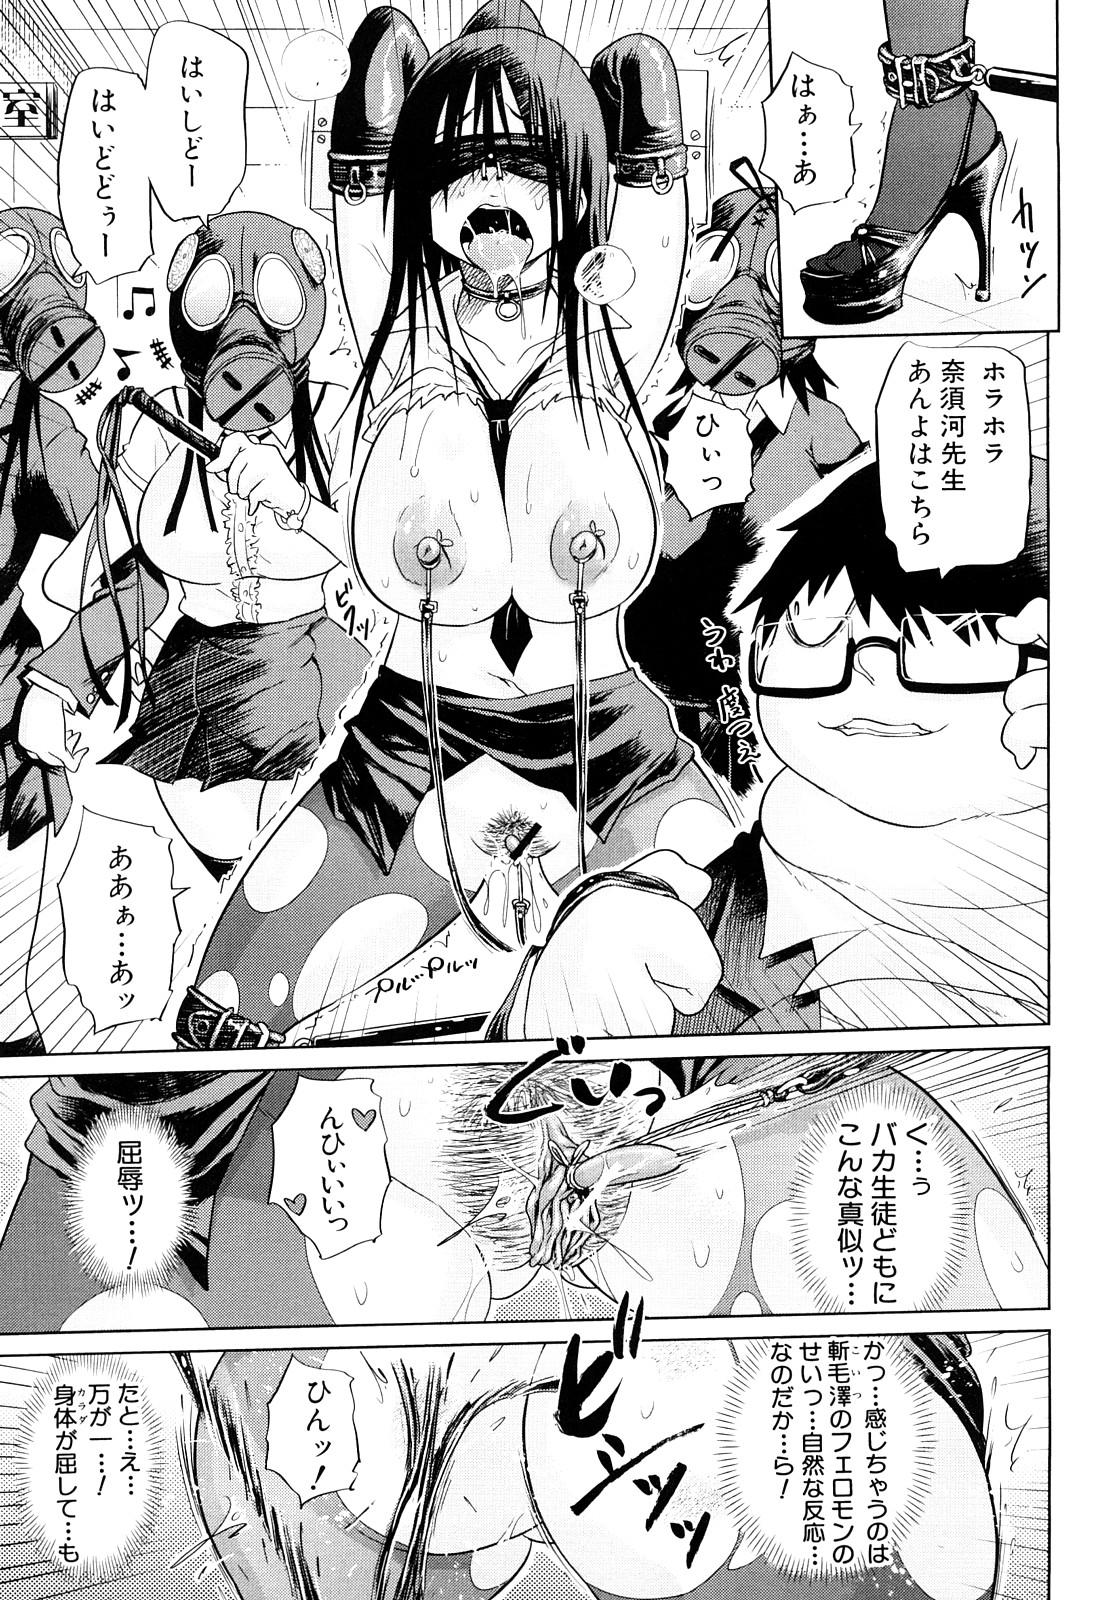 Seifuku Mesubuta Chitai - The Nymphomaniac Zone 51